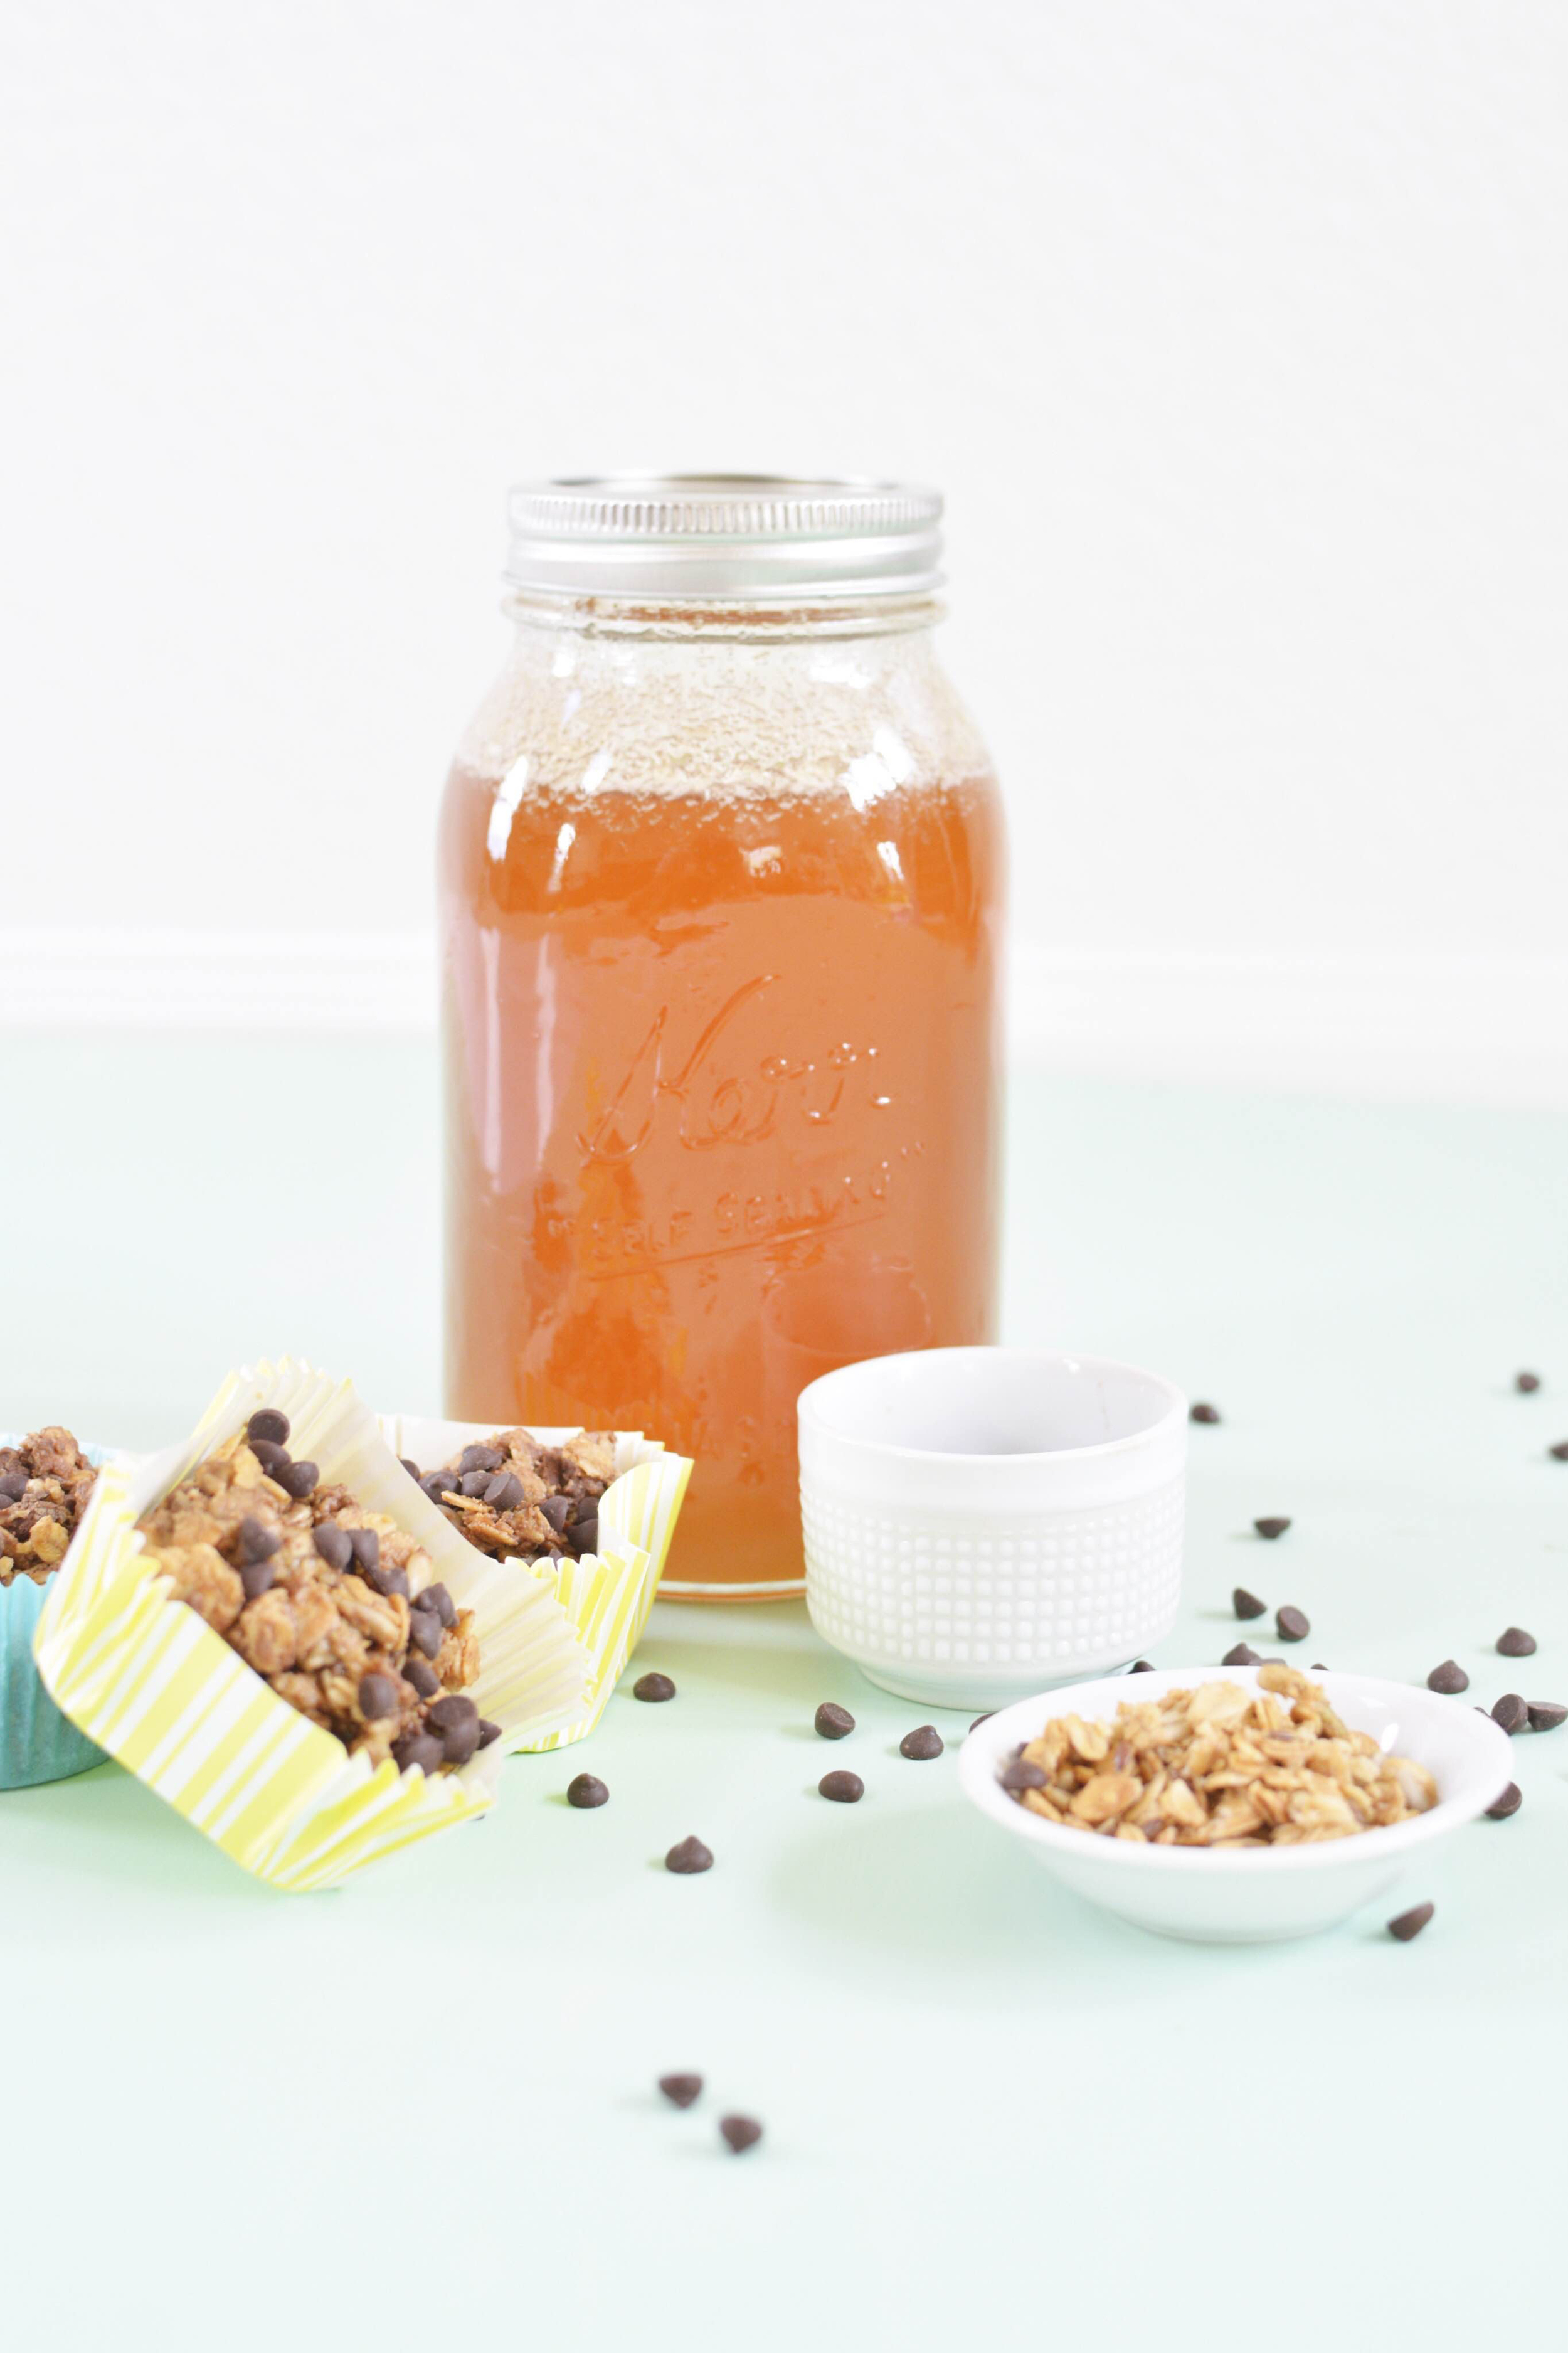 4 ingredient granola bars